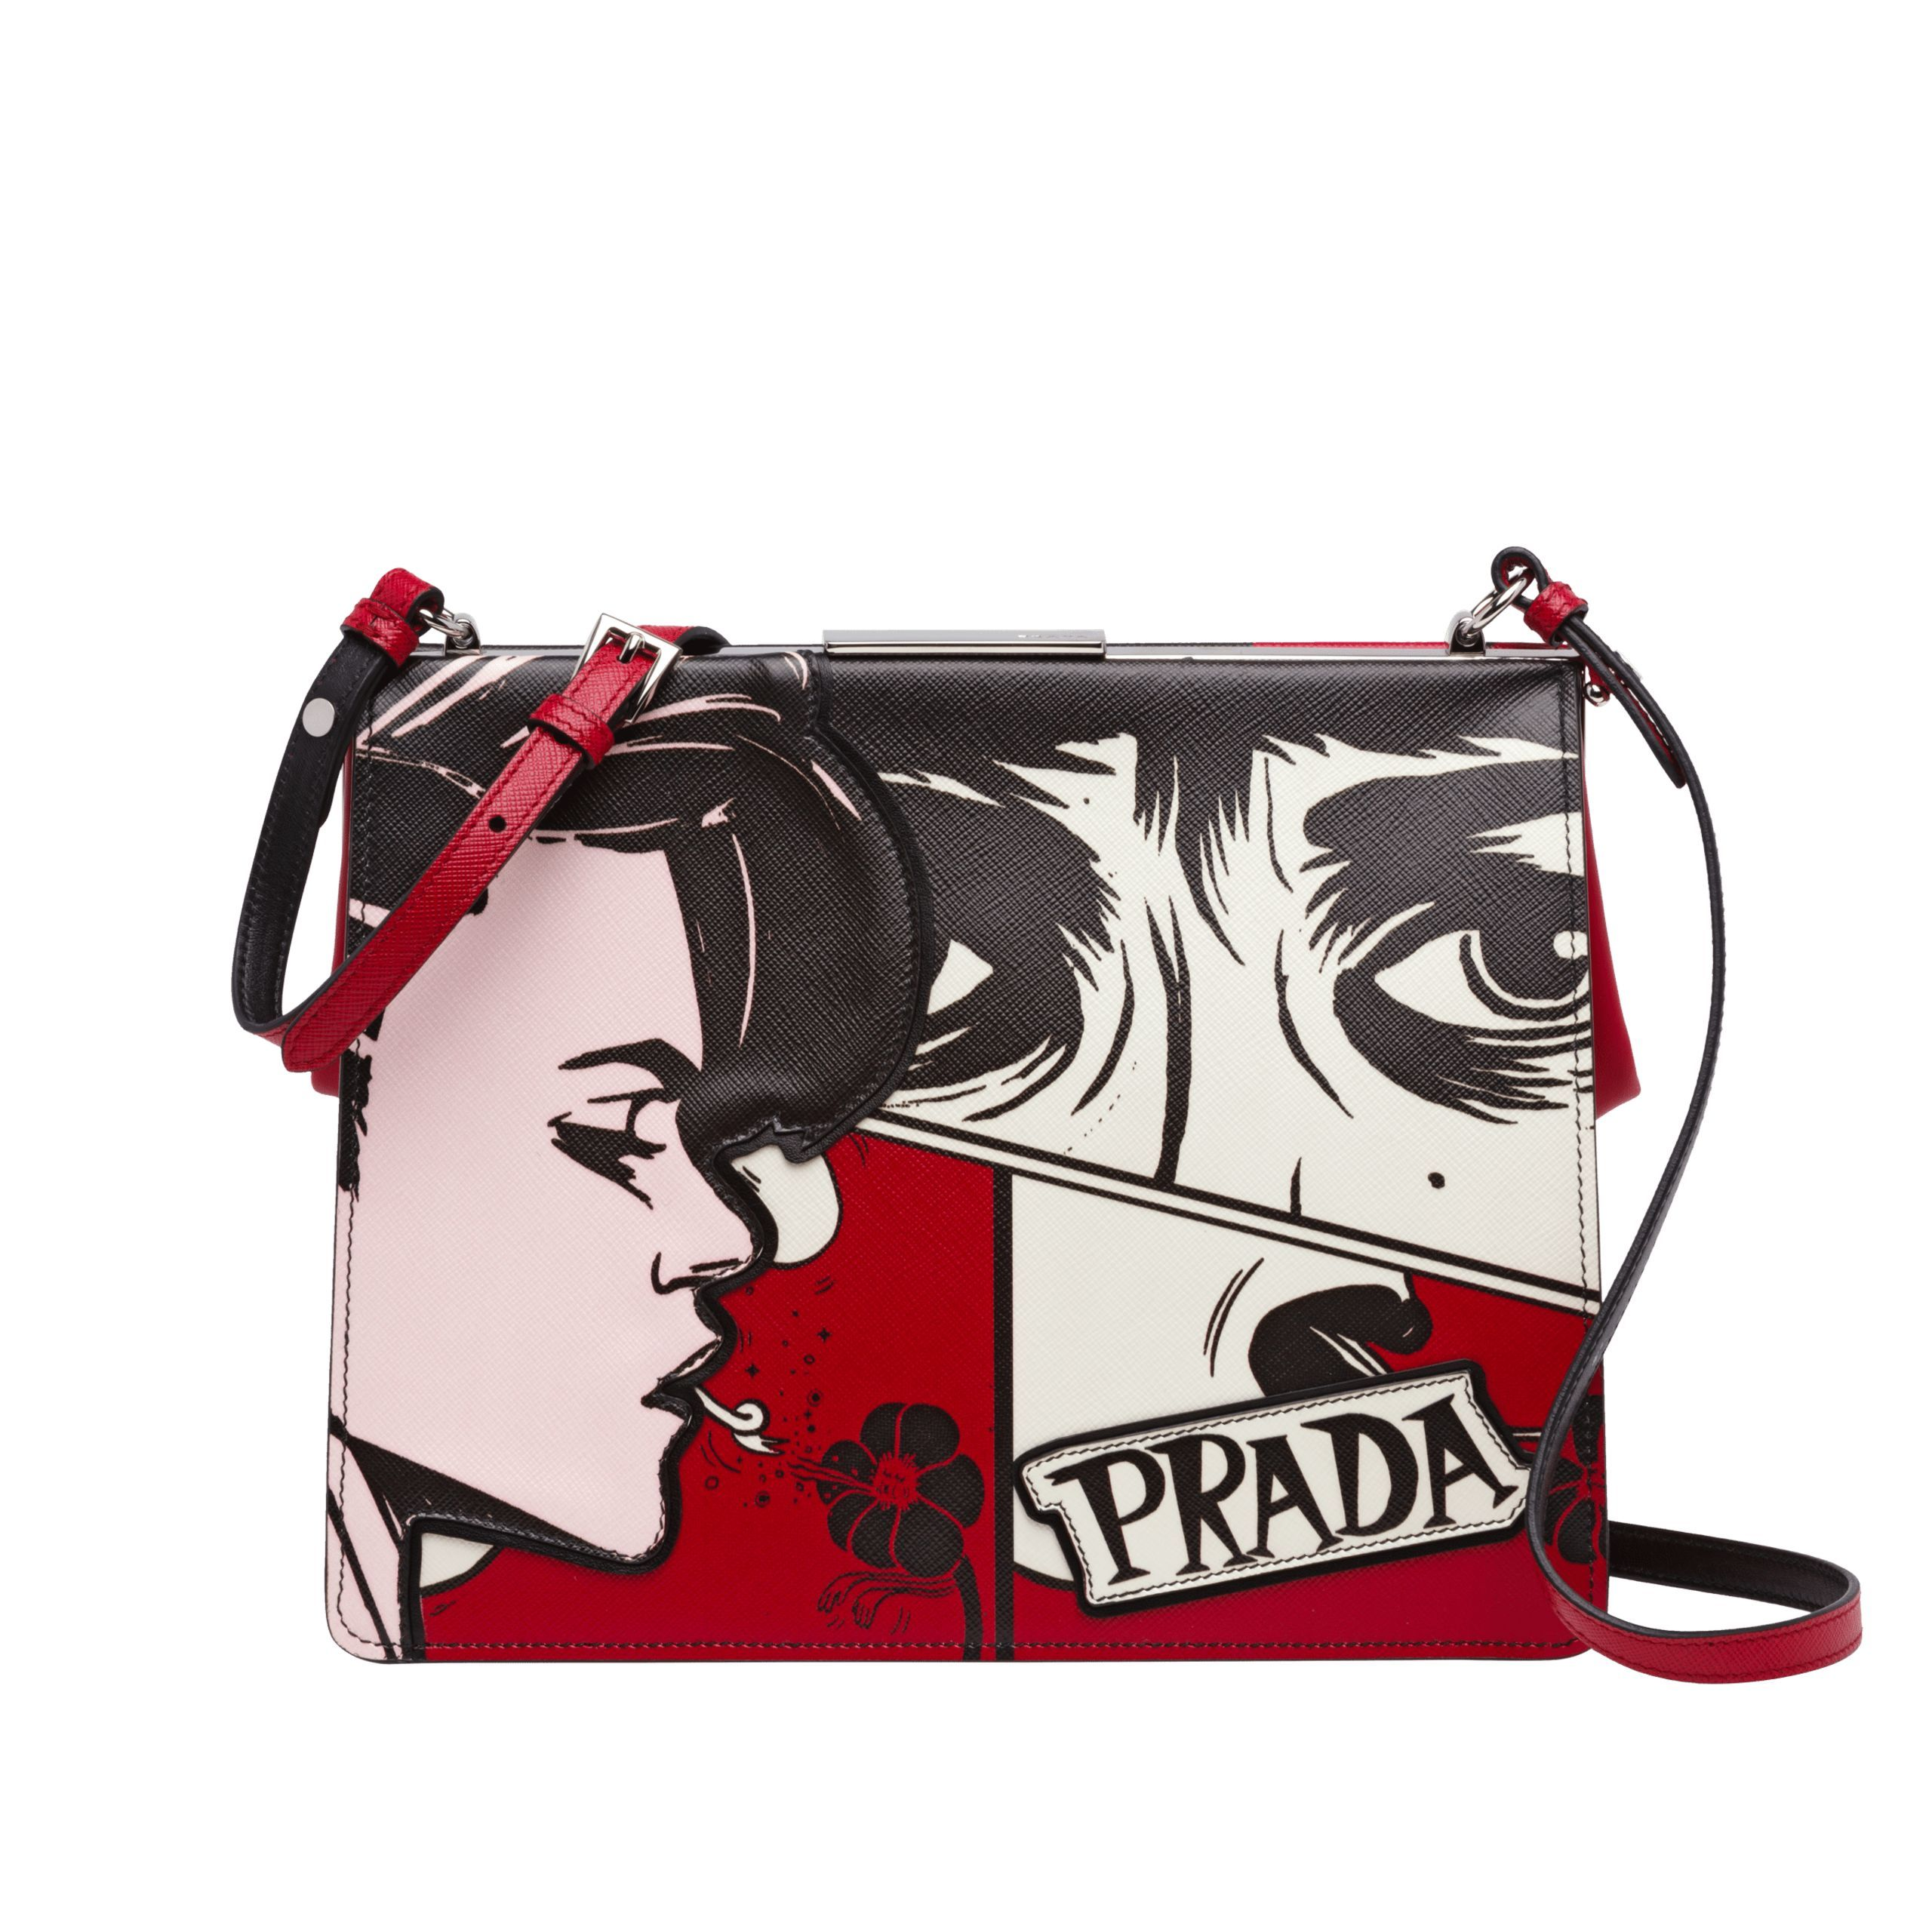 5720072b422f35 Prada | Light Frame Printed Leather Bag | $2,400 | Characterized by the  distinctive metal spring hinge frame, the Saffiano leather Prada Light  Frame bag is ...